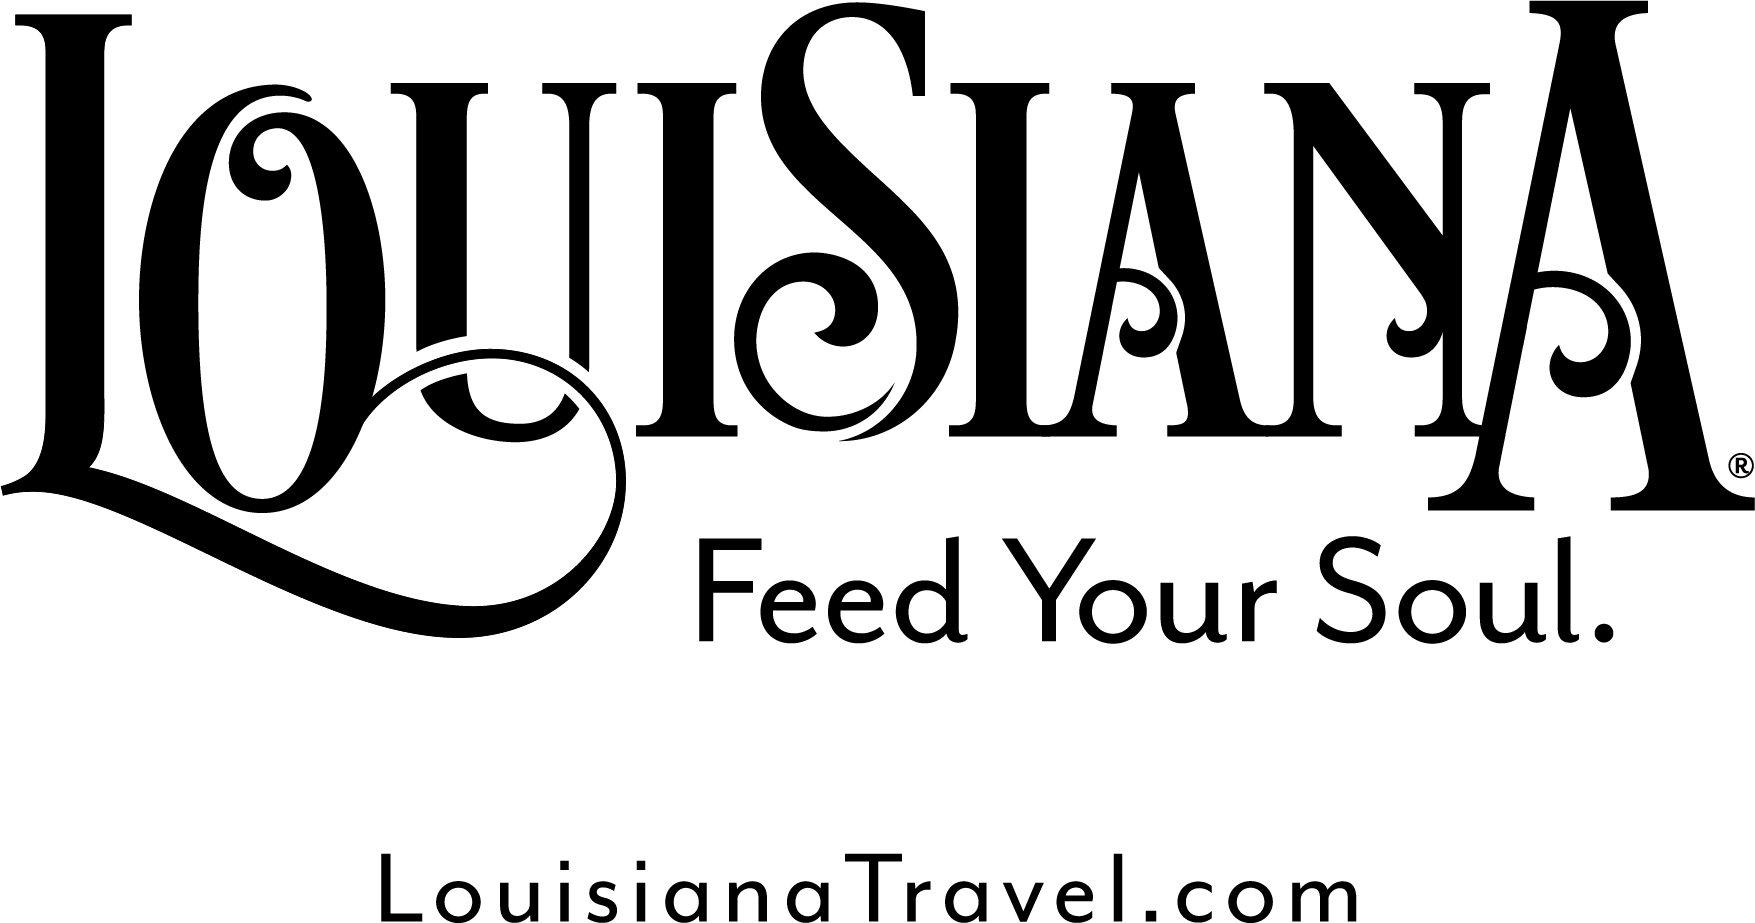 LA Travel logo